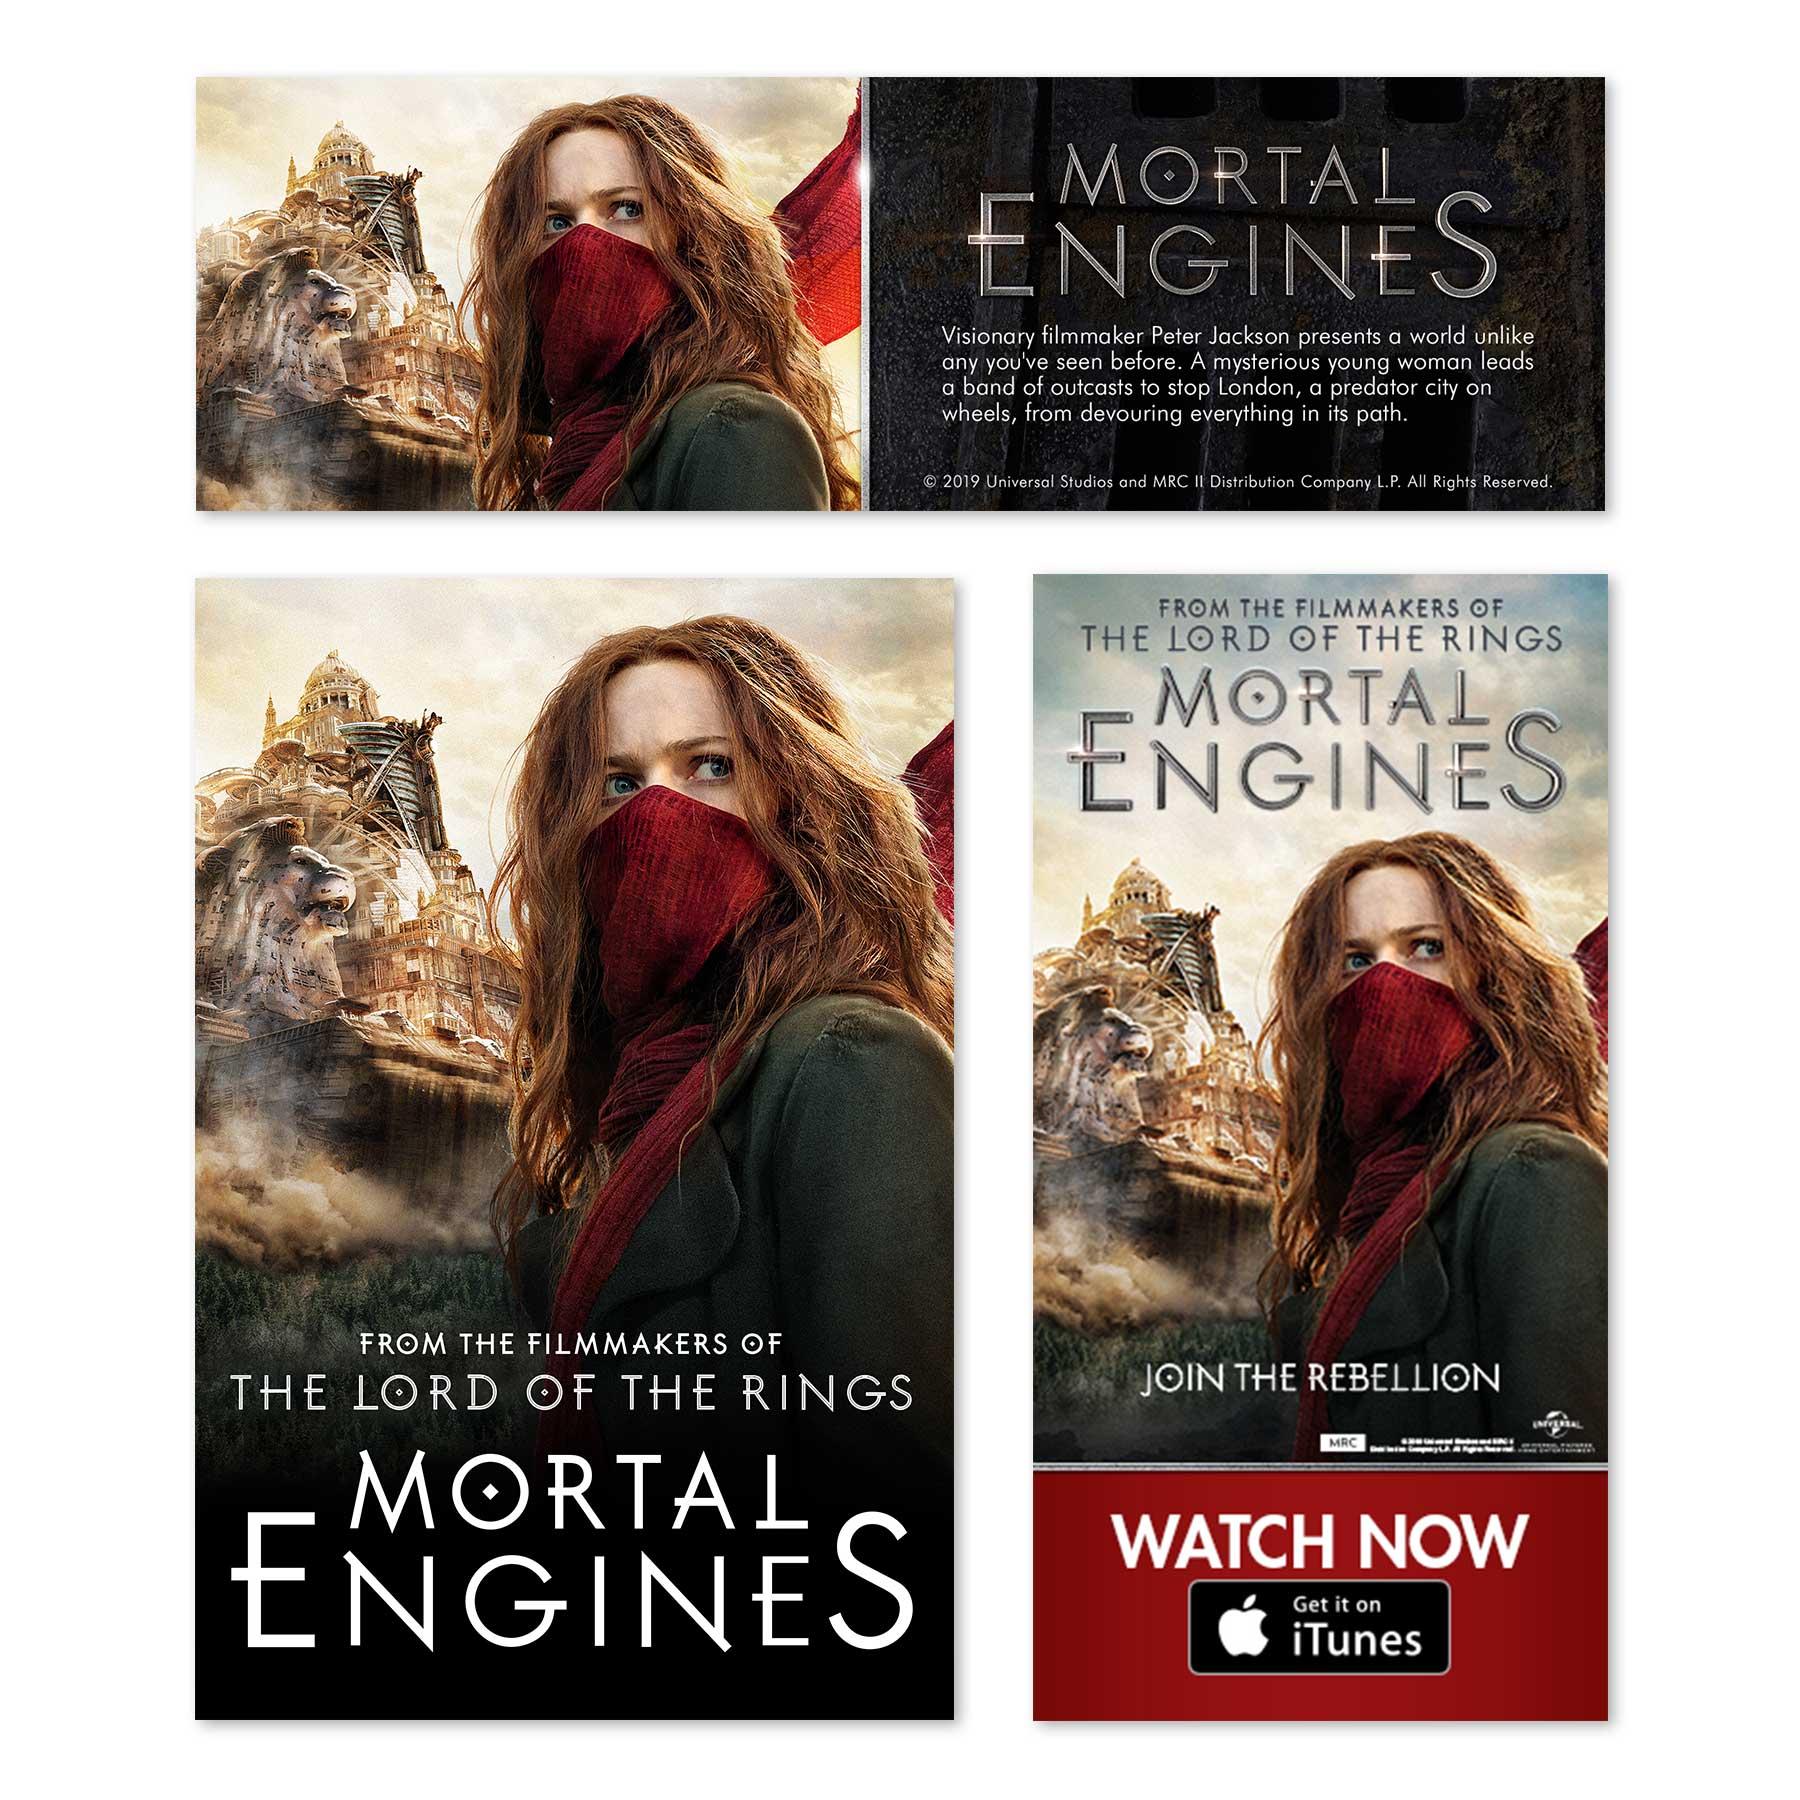 Mortal Engines Amazon & iTunes Banners